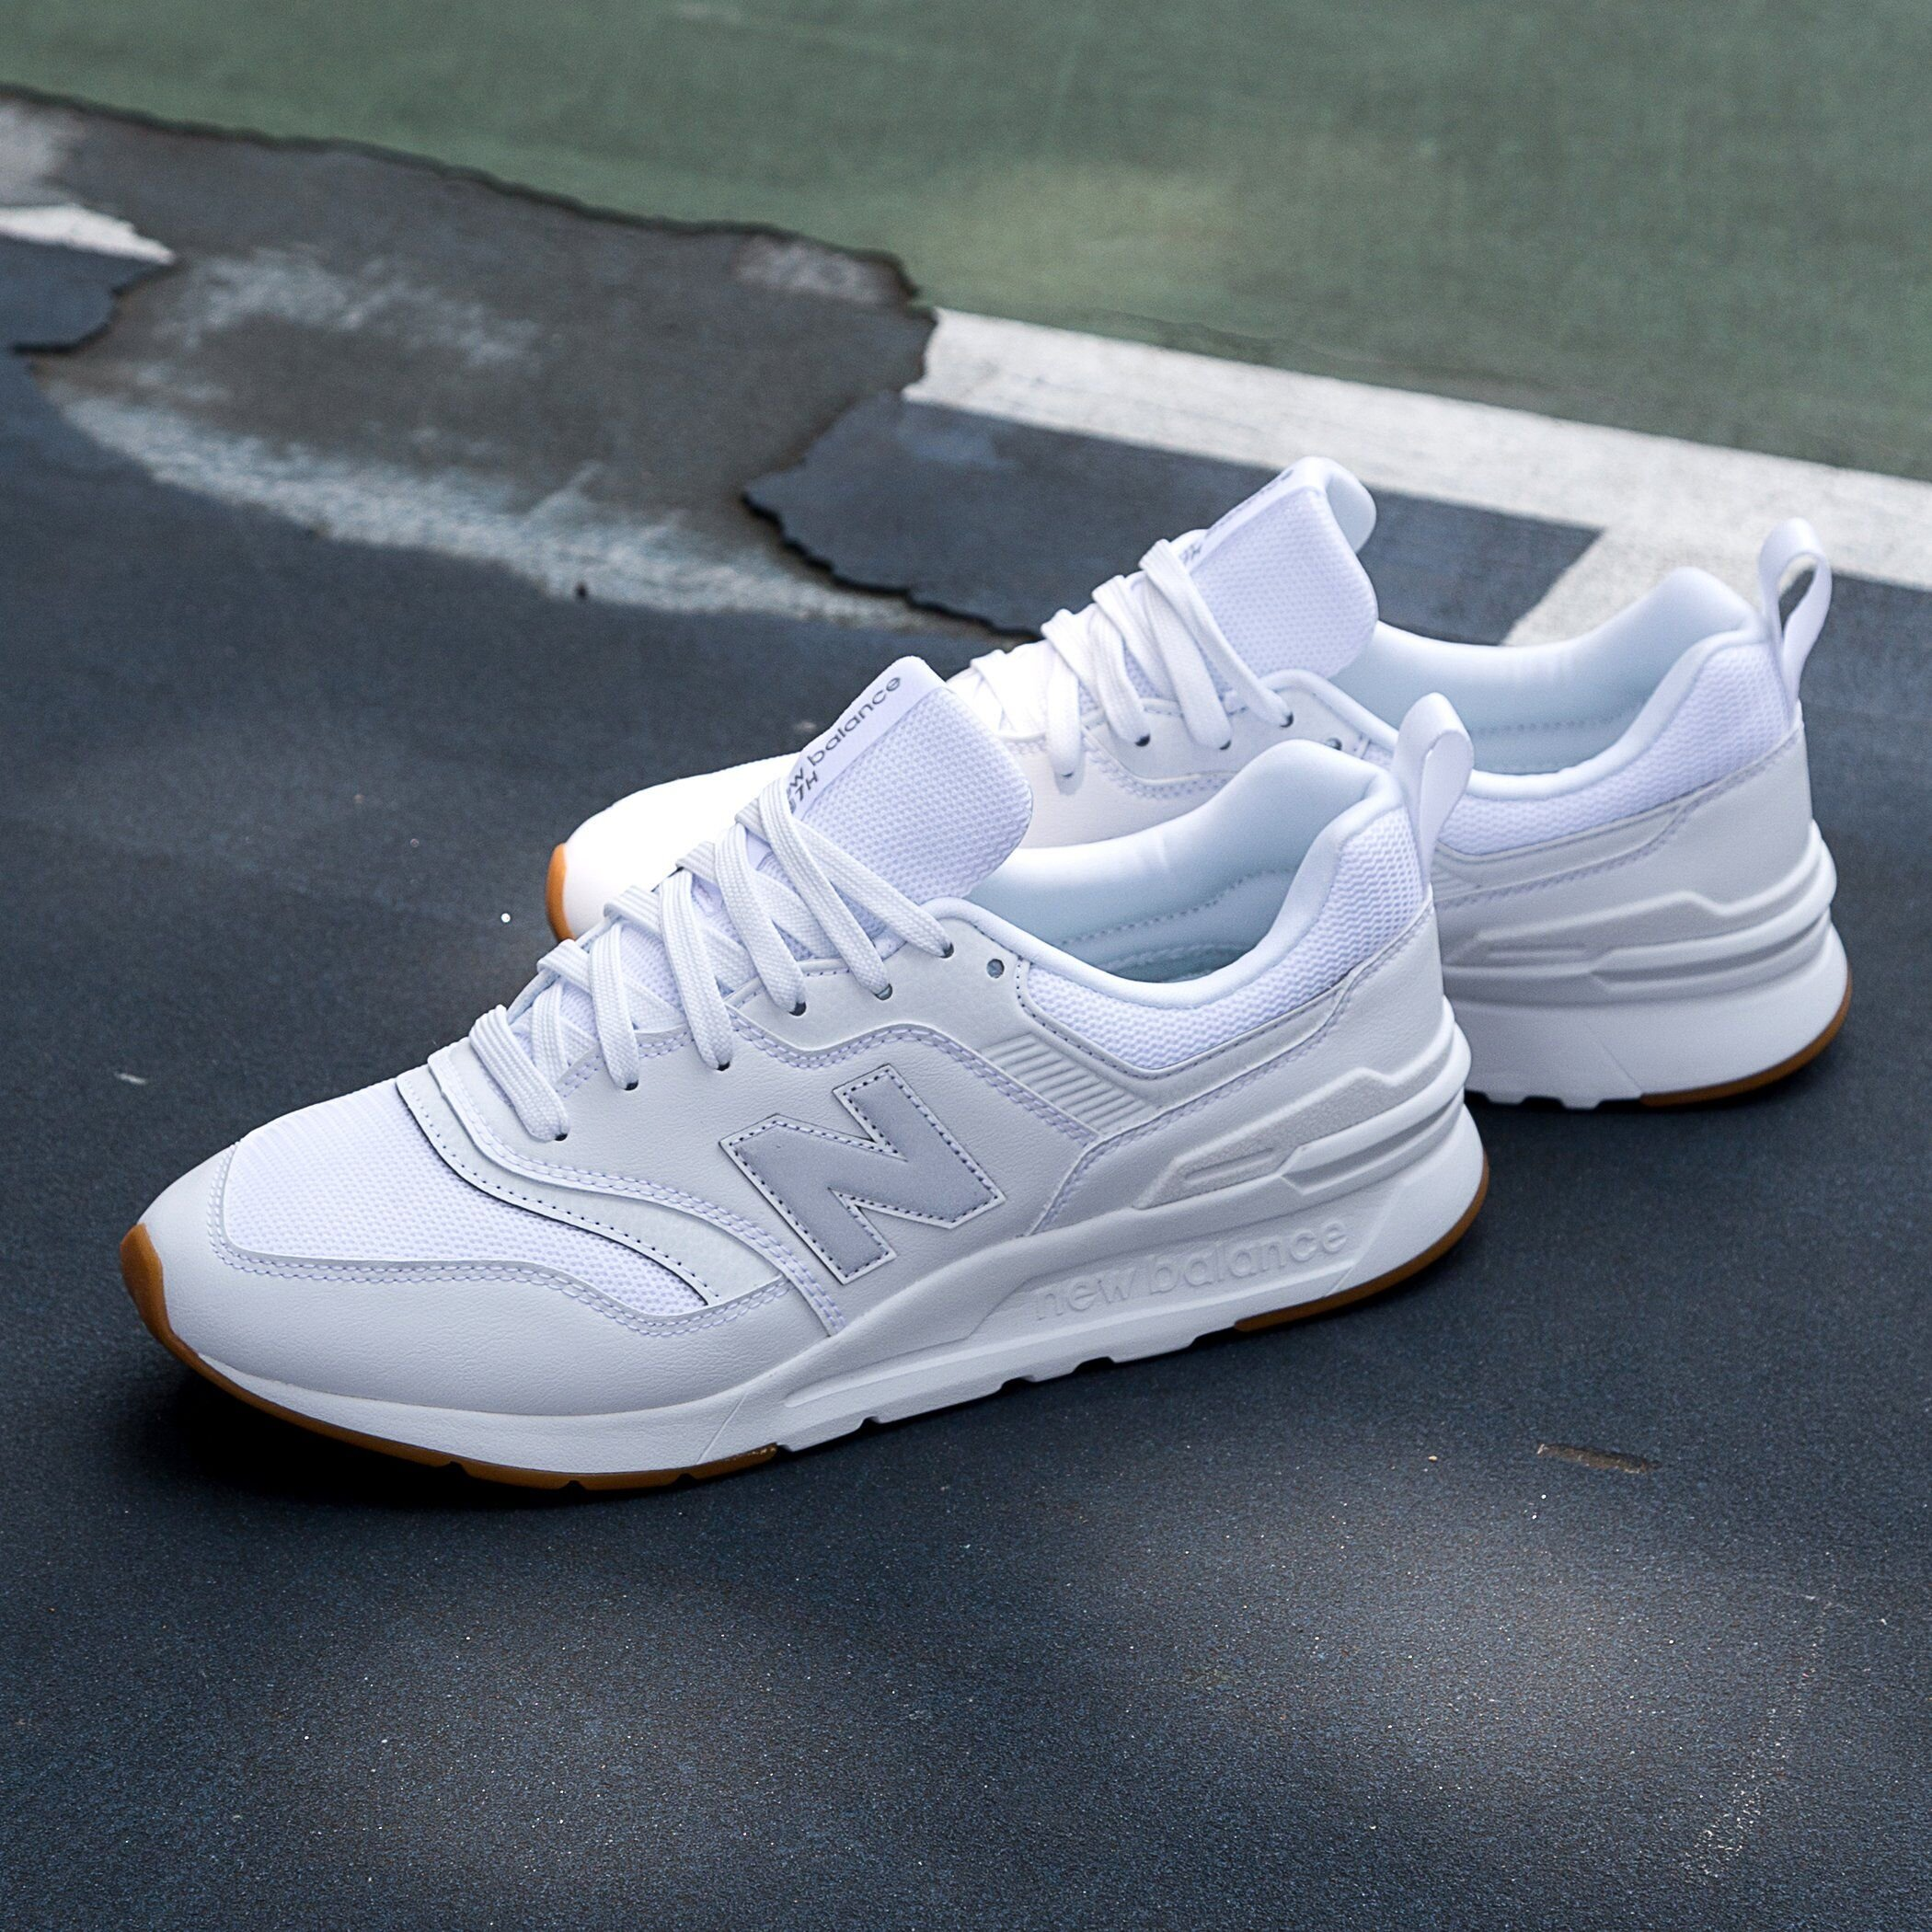 new balance 997h white